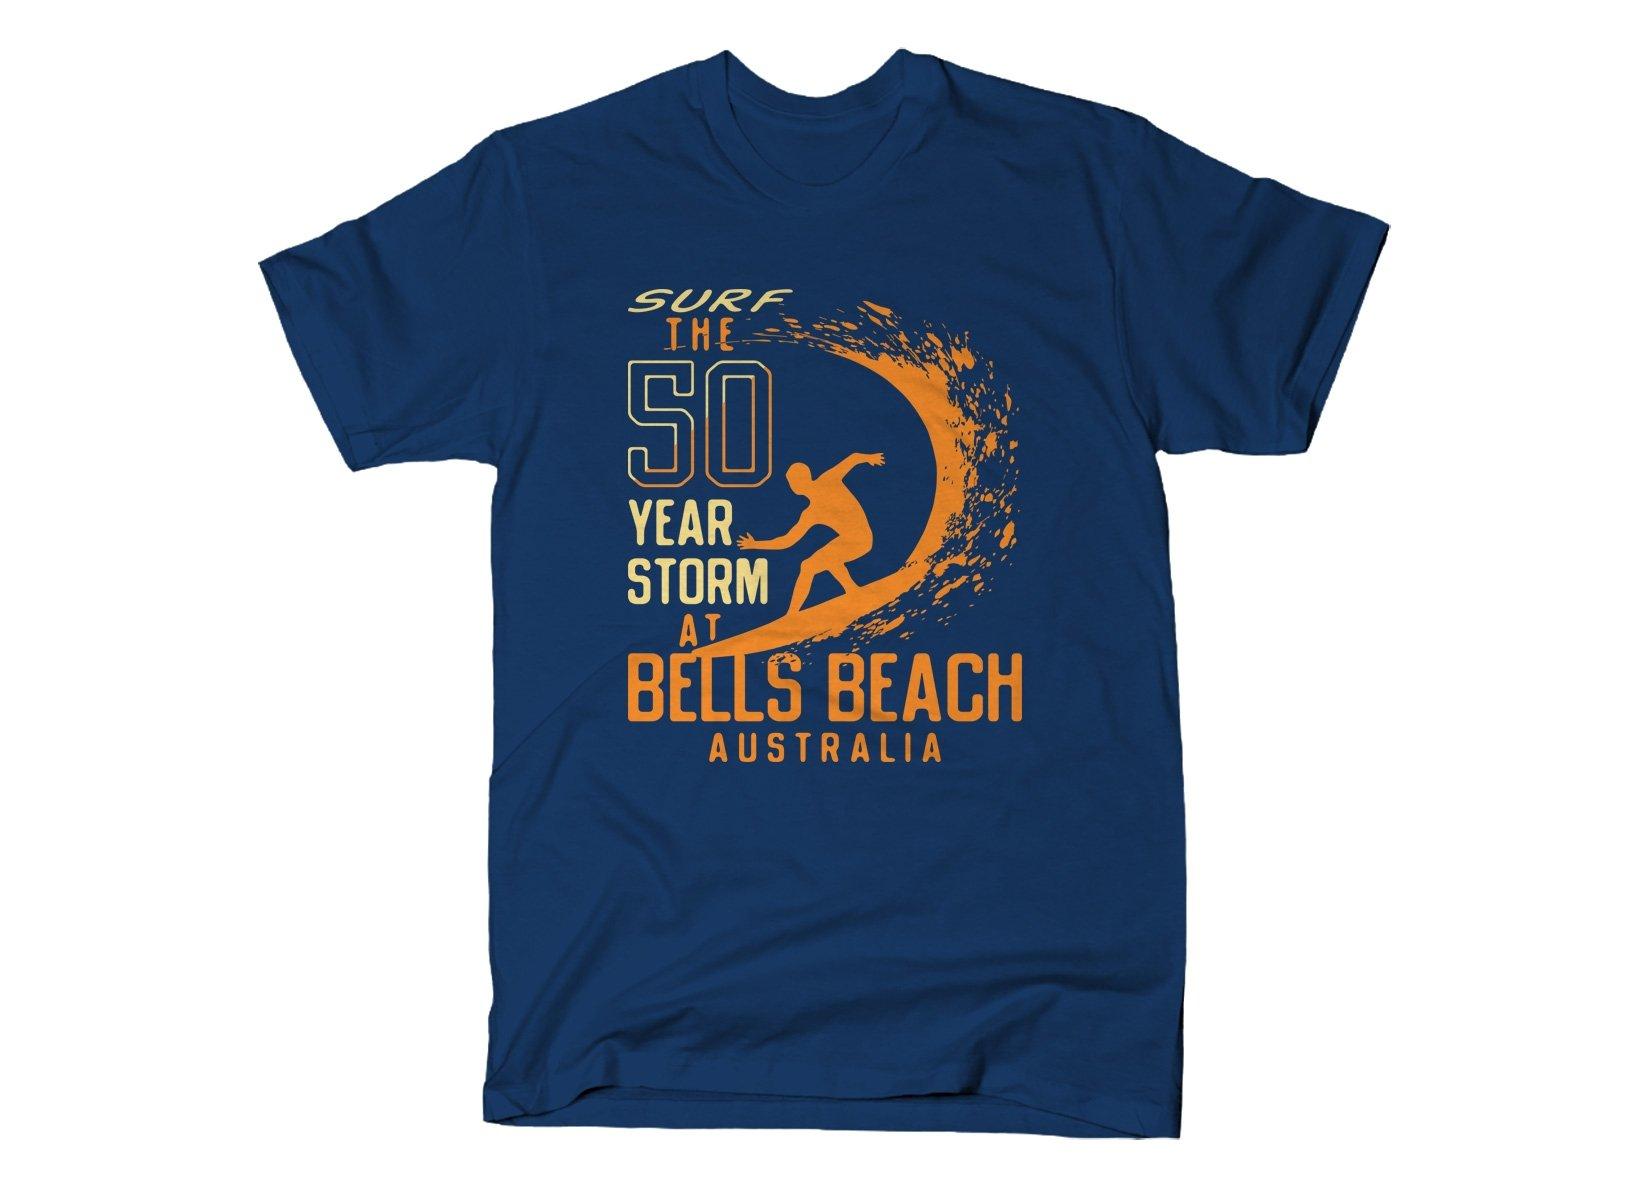 50 Year Storm At Bells Beach on Mens T-Shirt